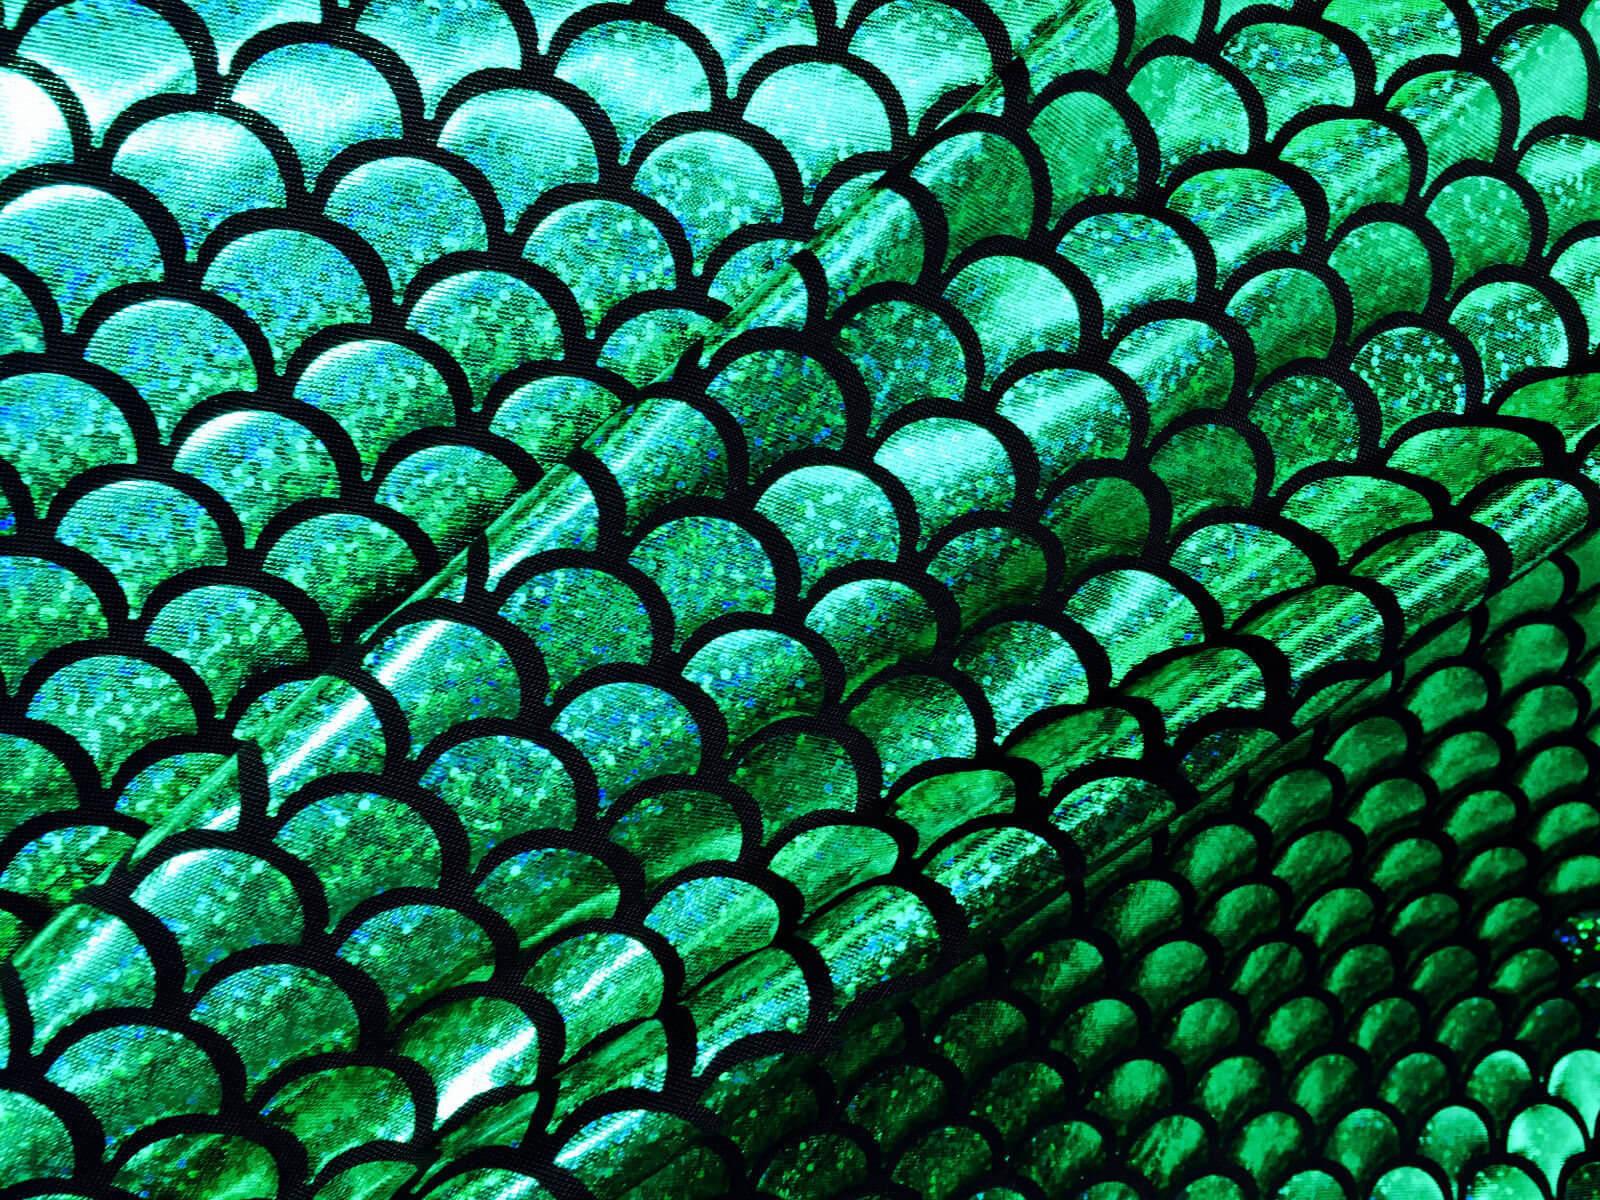 mermaid-scale-fabric-fish-tail-material-stretch-spandex-57-145cm-wide-green-black-5b6b65ff1.jpg